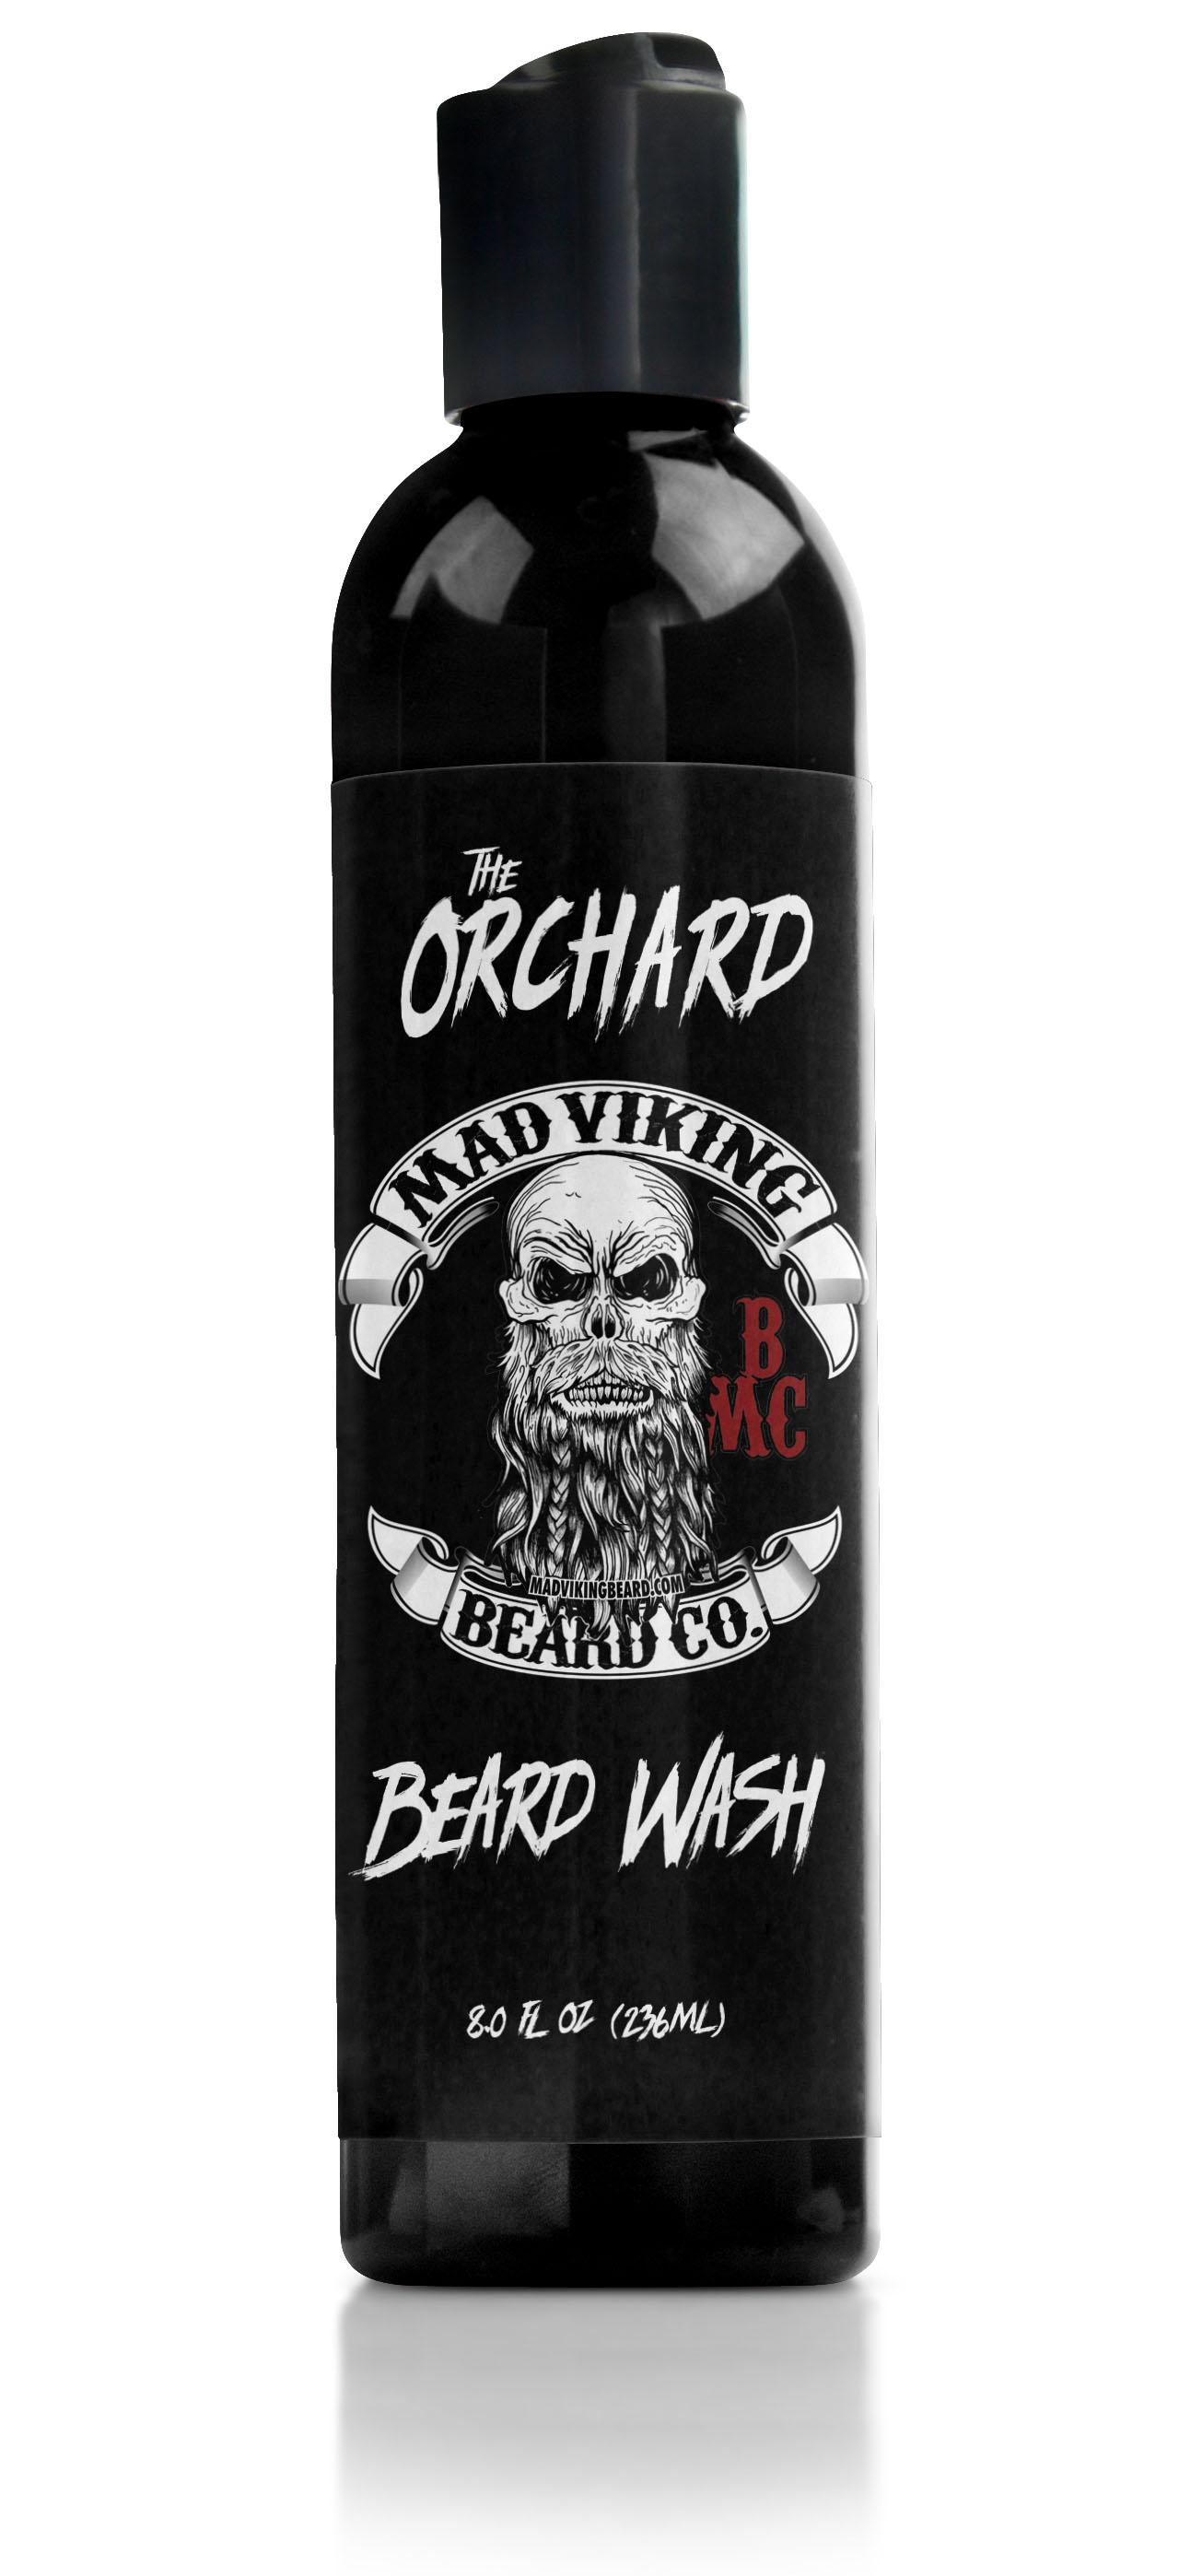 Orchard Mad Viking's Beard Wash